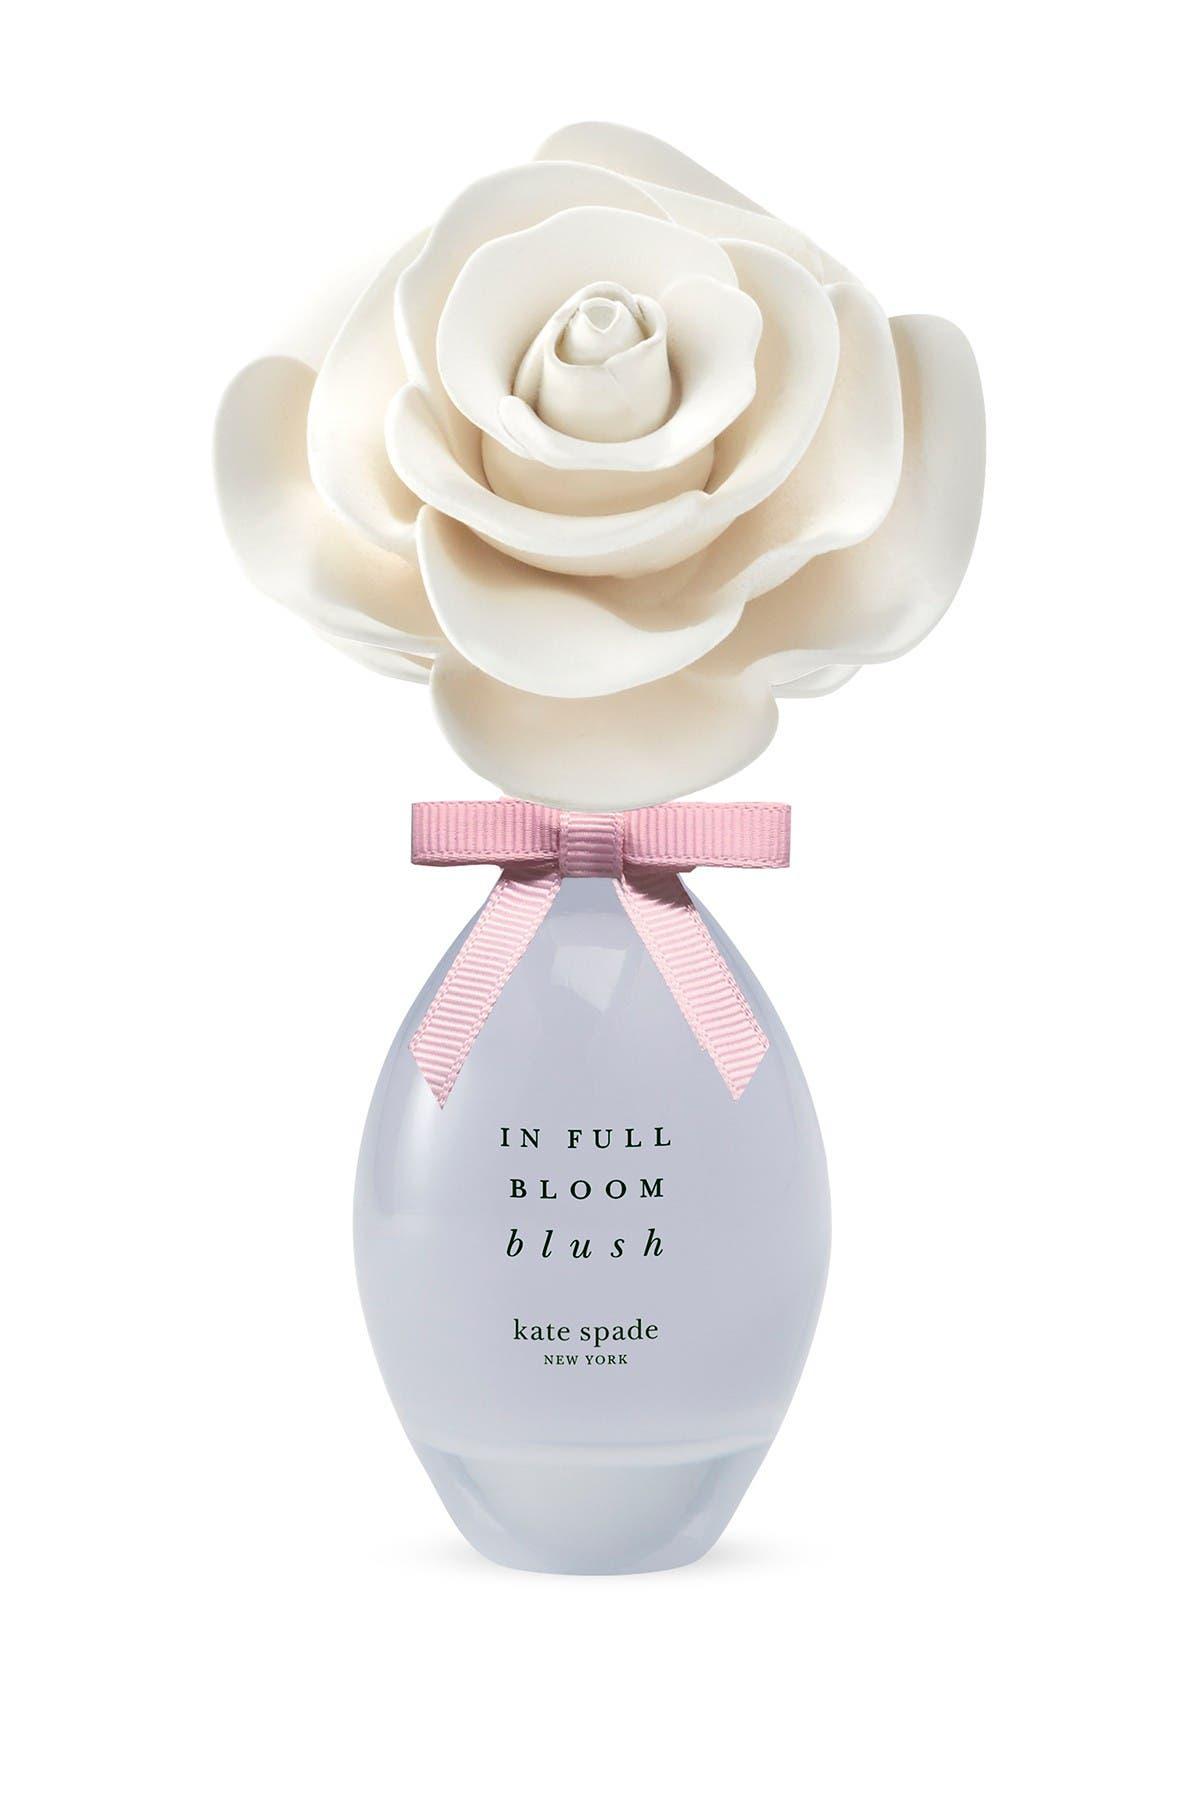 Image of kate spade new york in full bloom blush 1.0 oz. eau de parfume